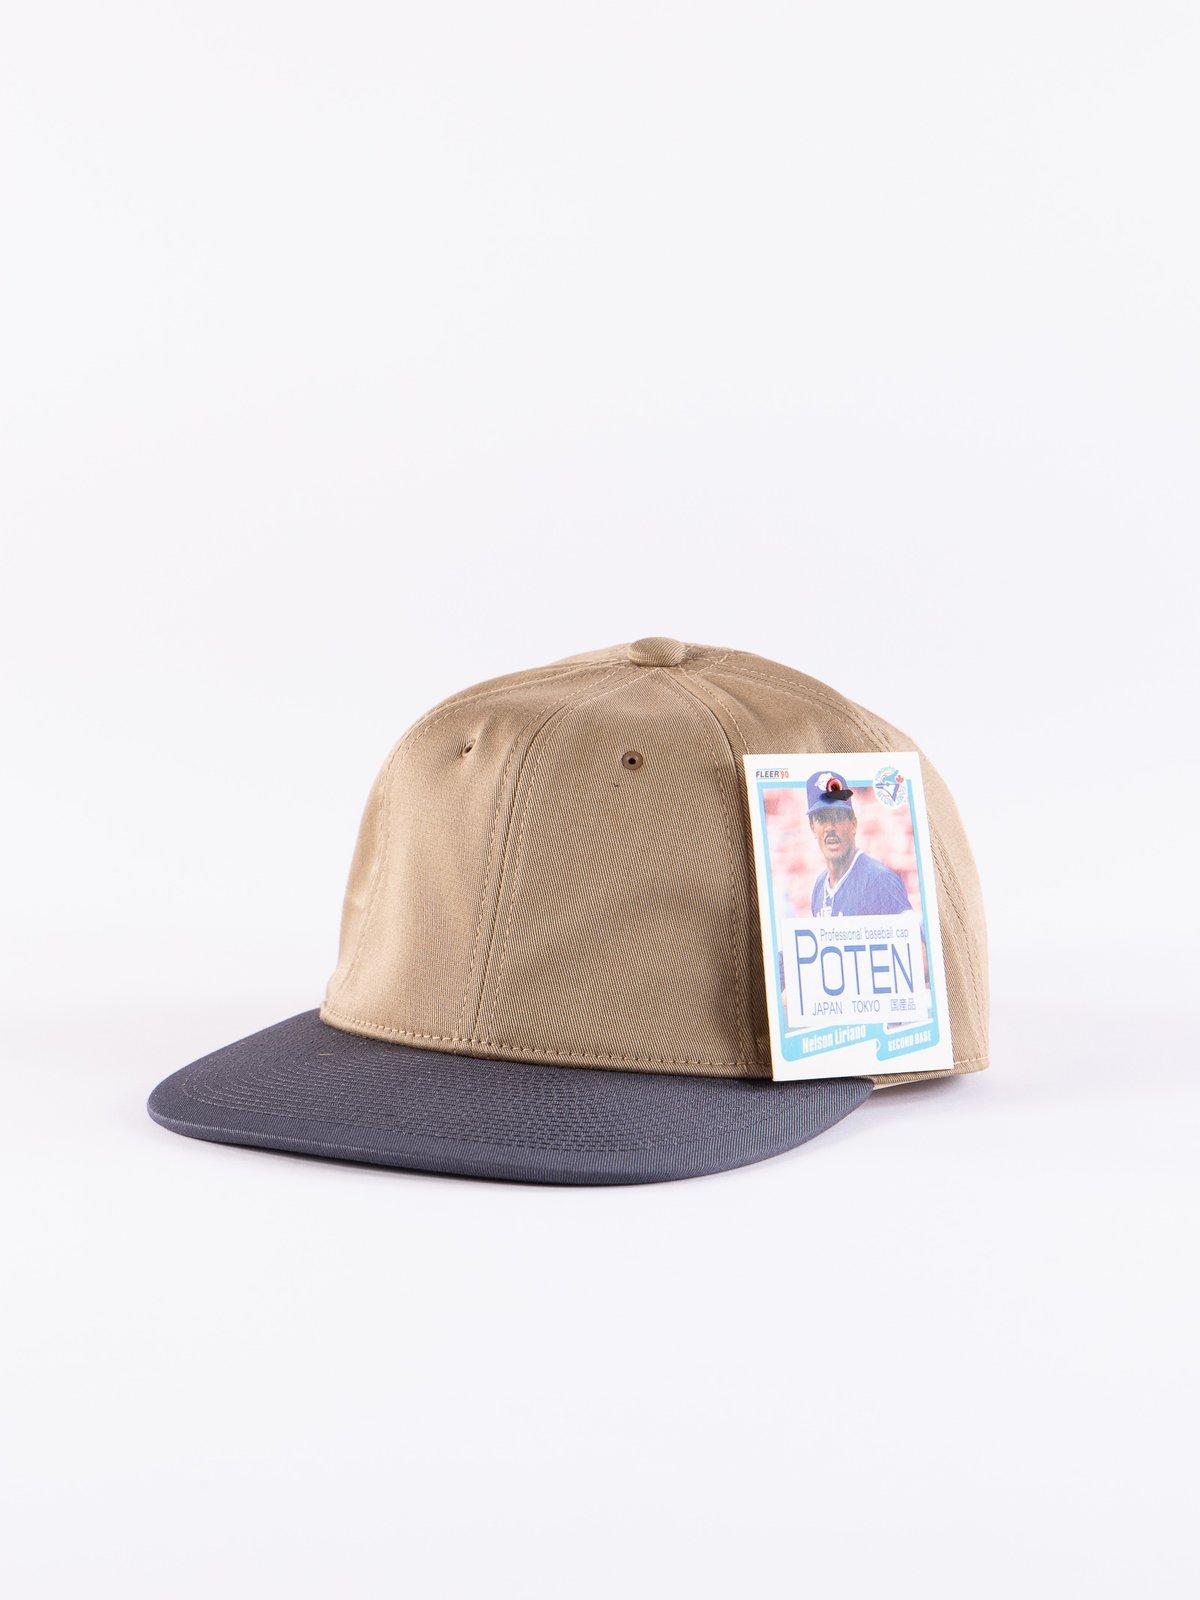 Beige/Black Chino Cap - Image 1